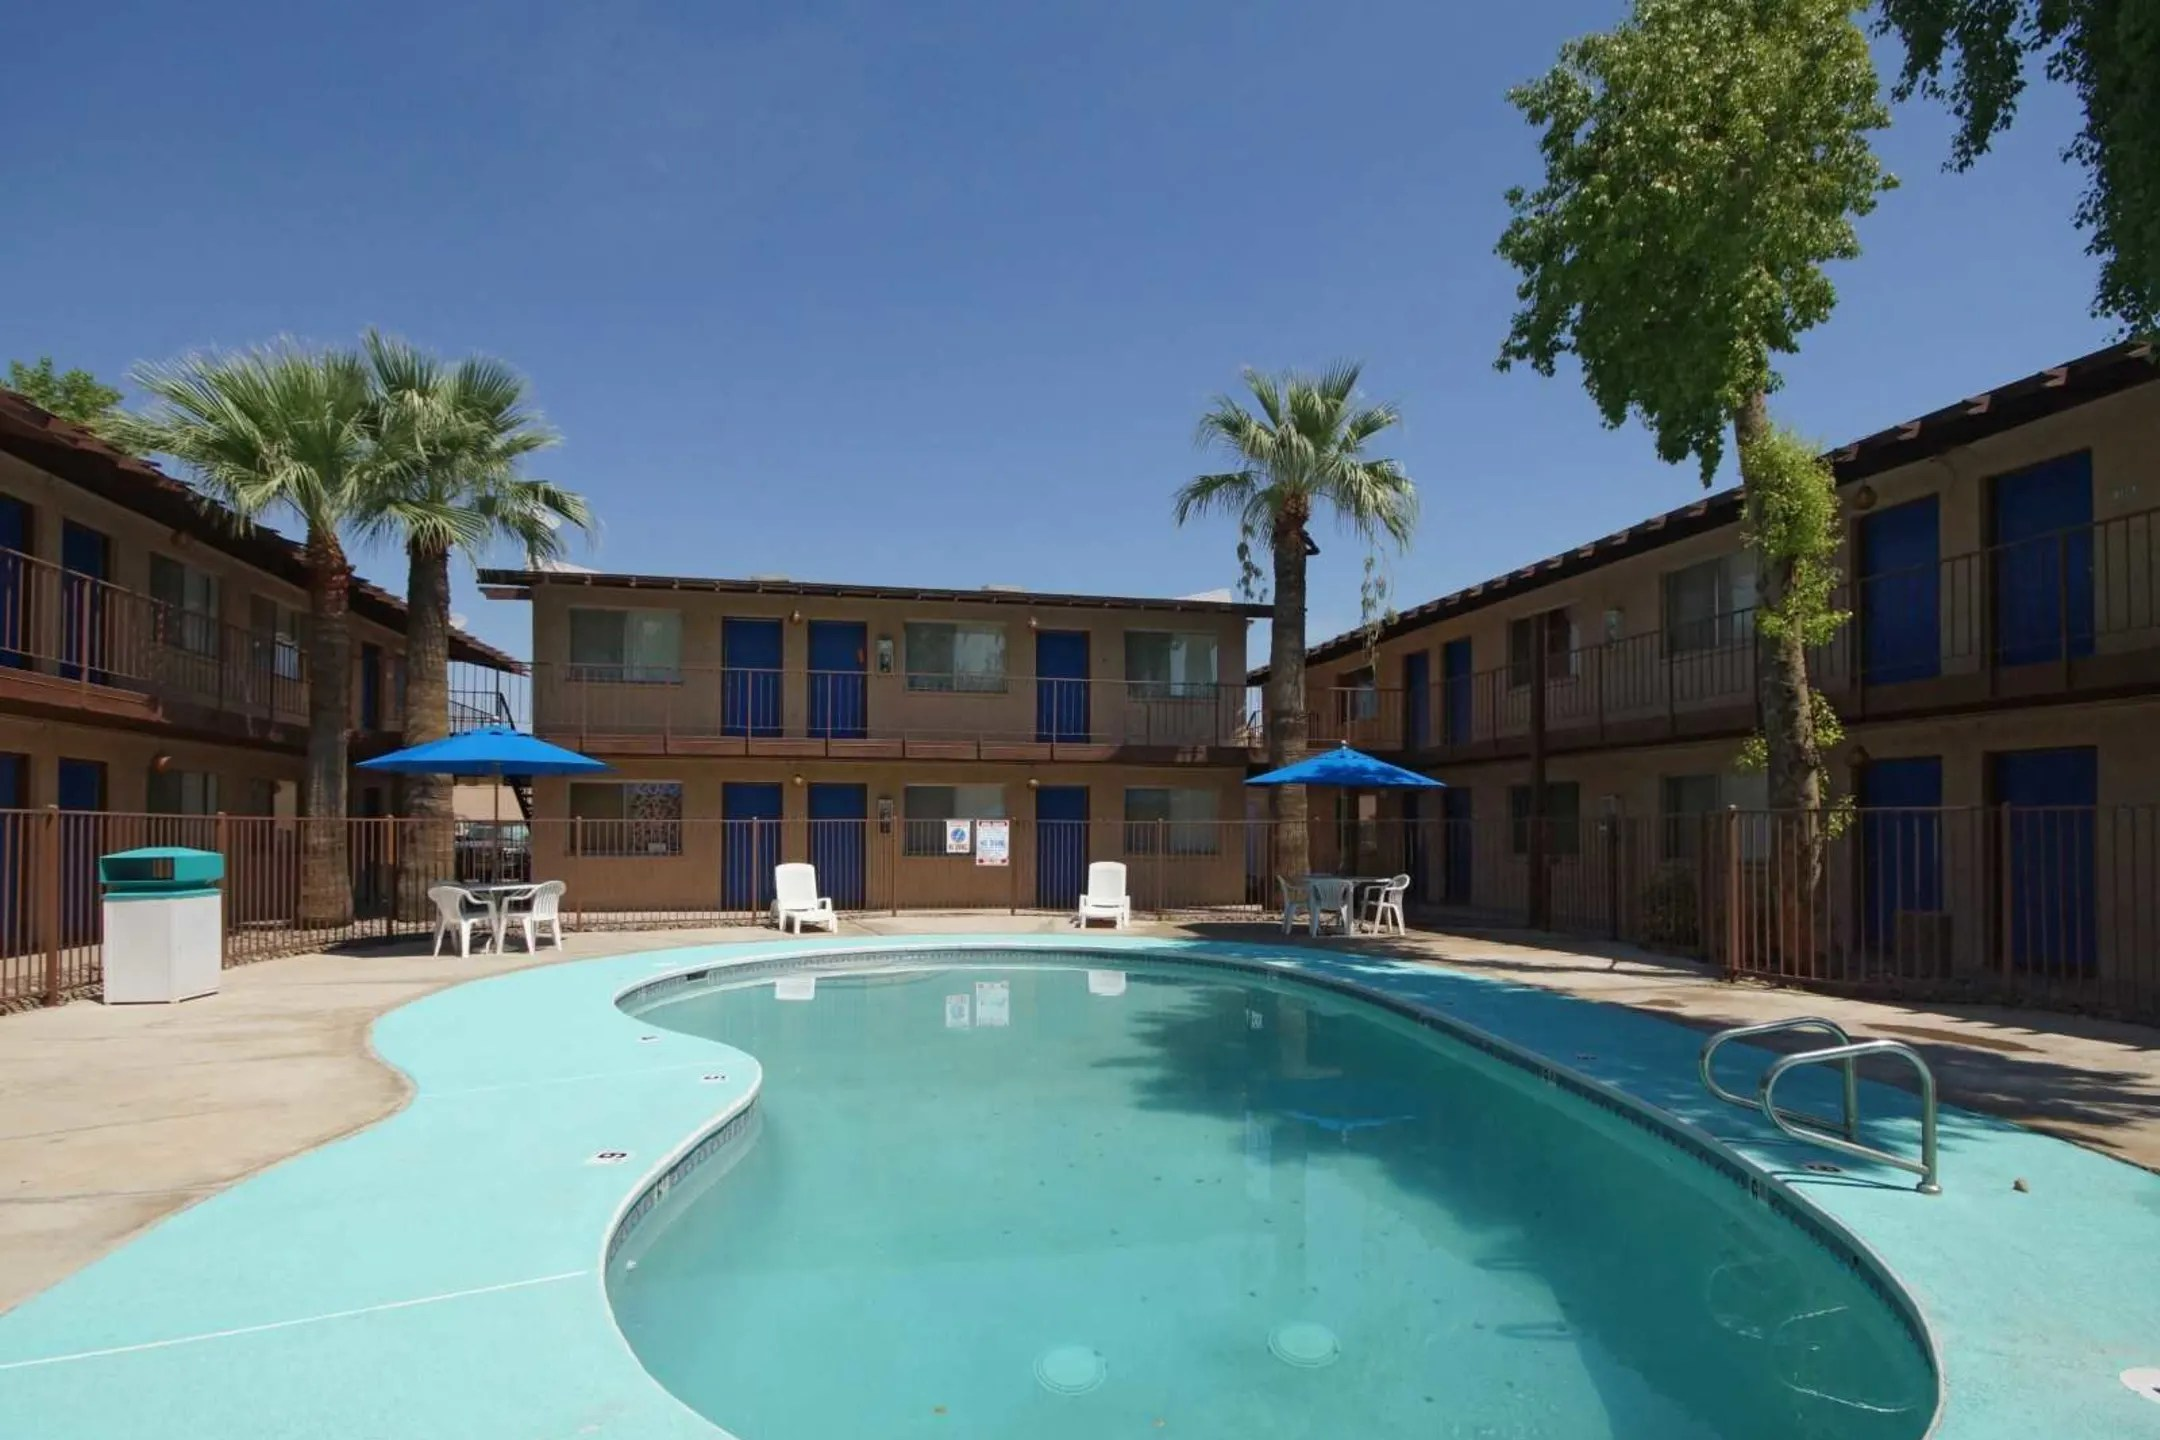 Chateau Gardens Apartments  Phoenix AZ 85301